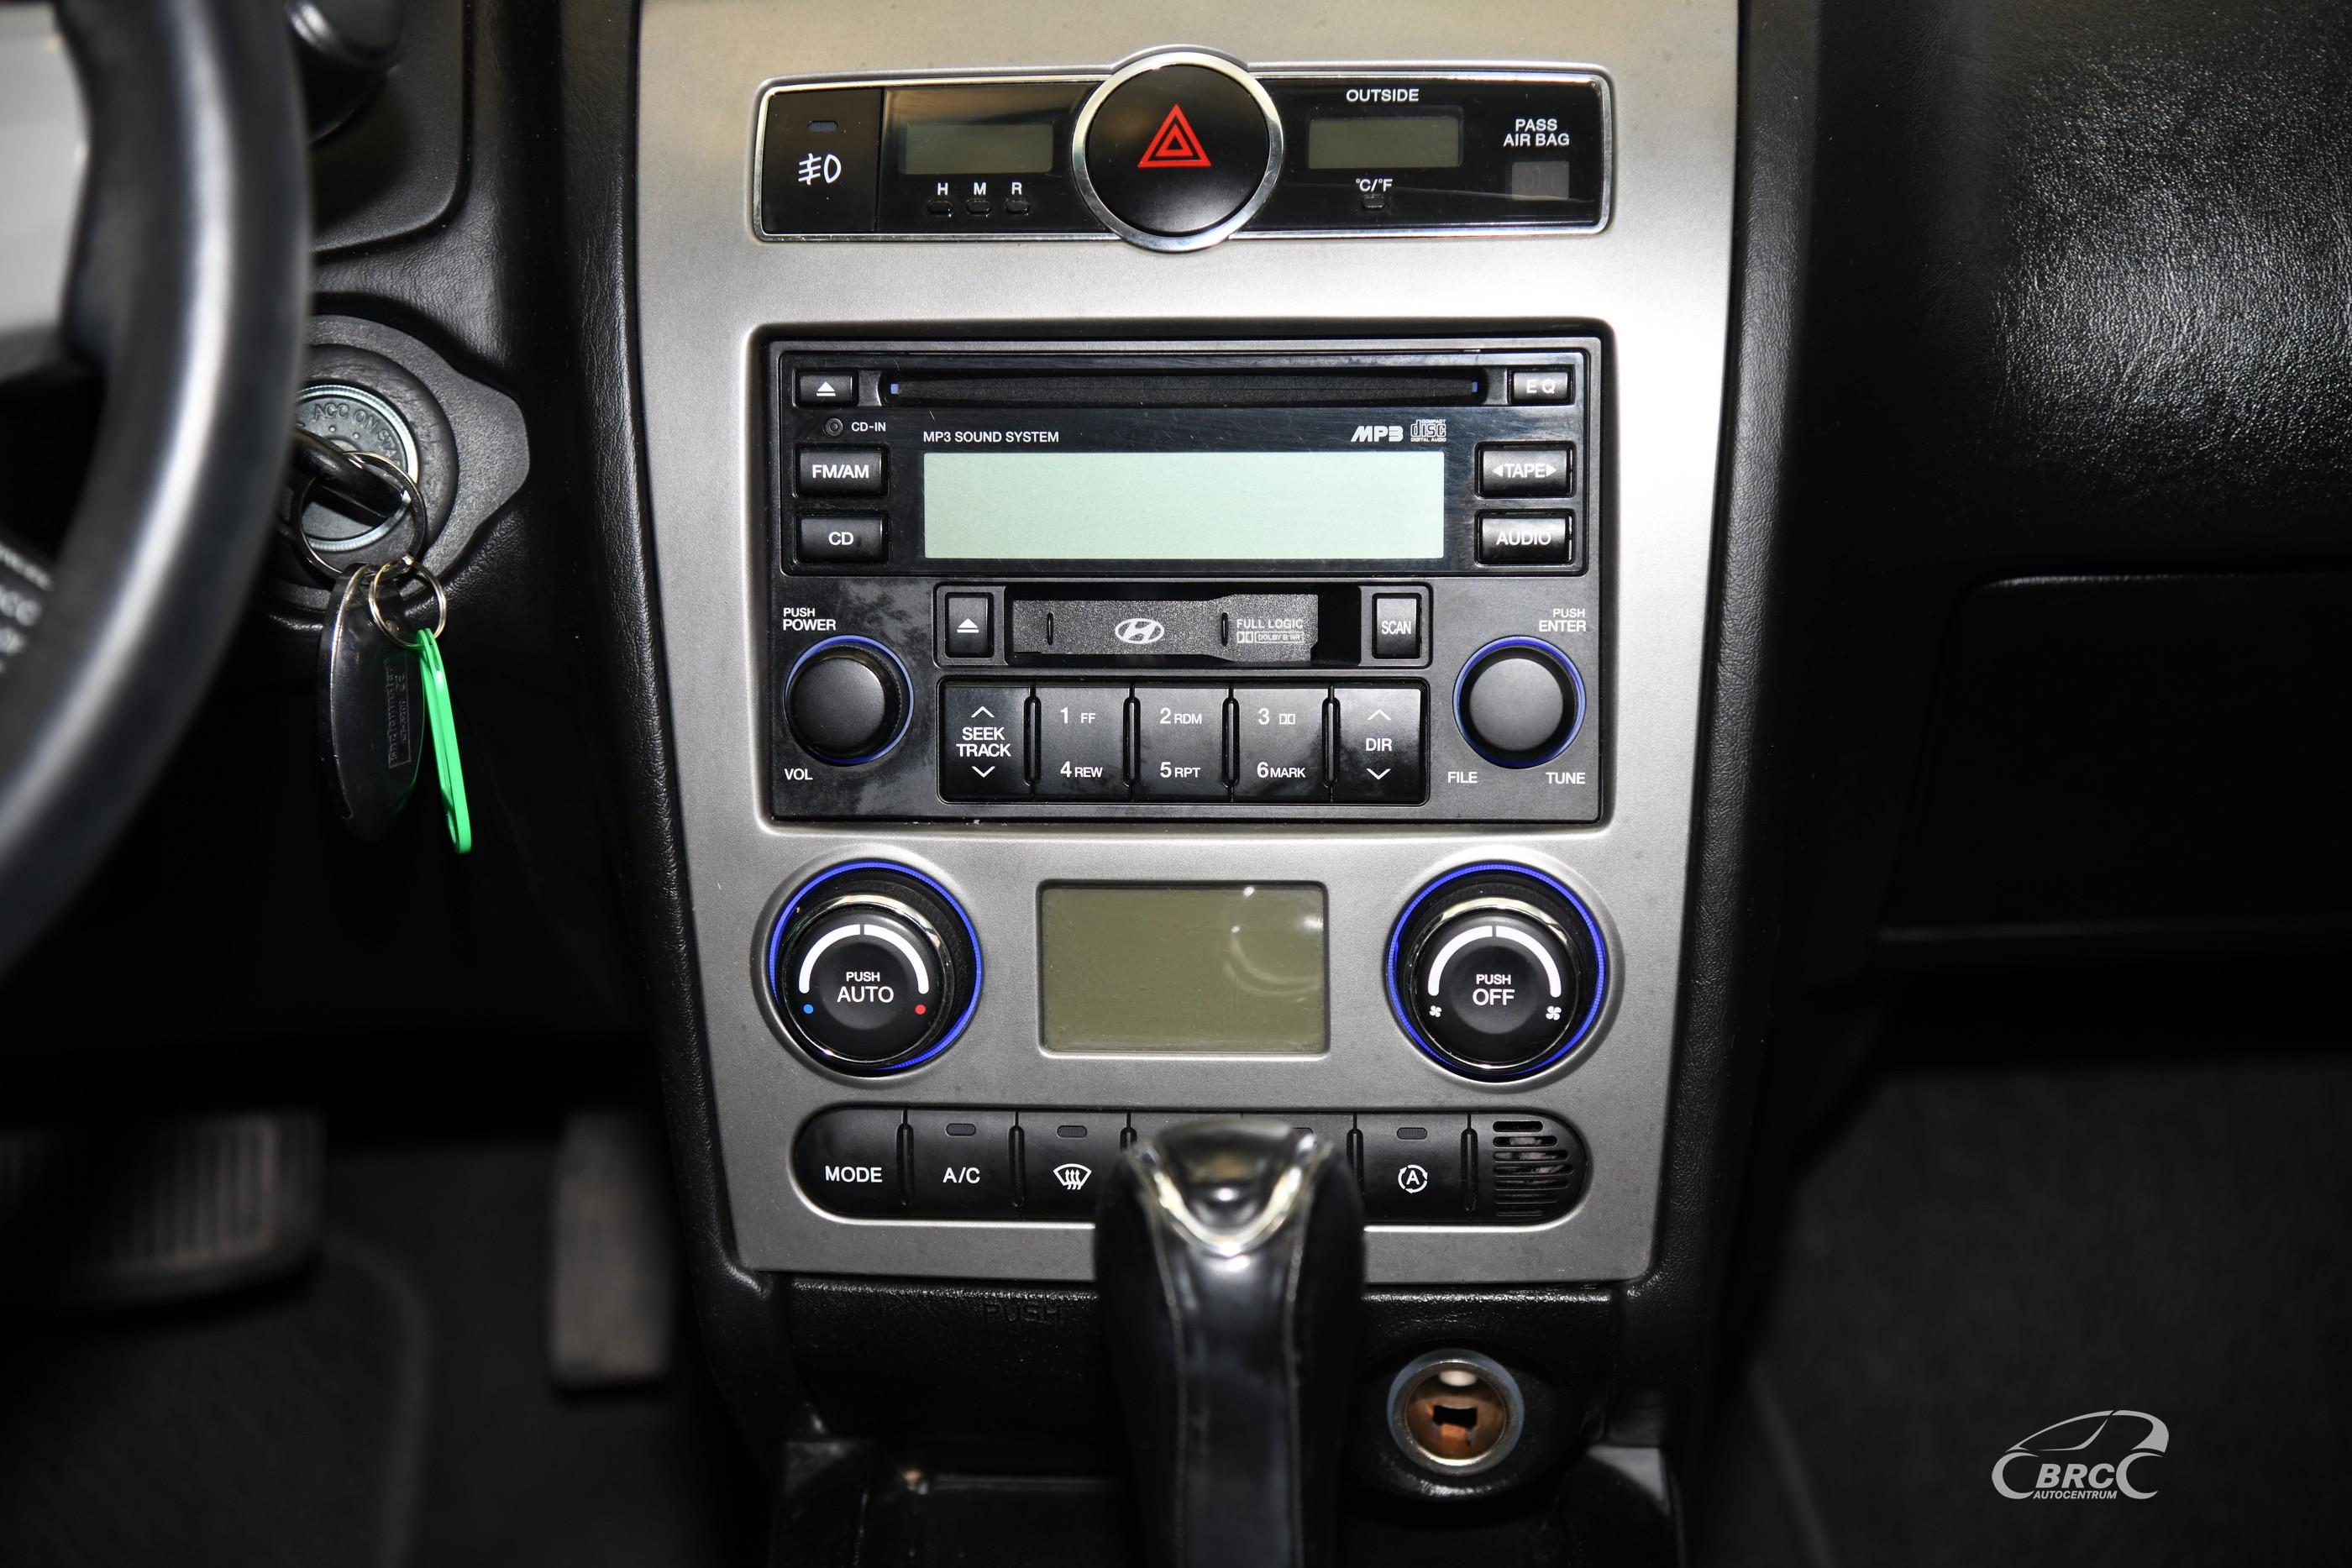 Hyundai Tiburon 2.7 GT V6 LPG Automatas